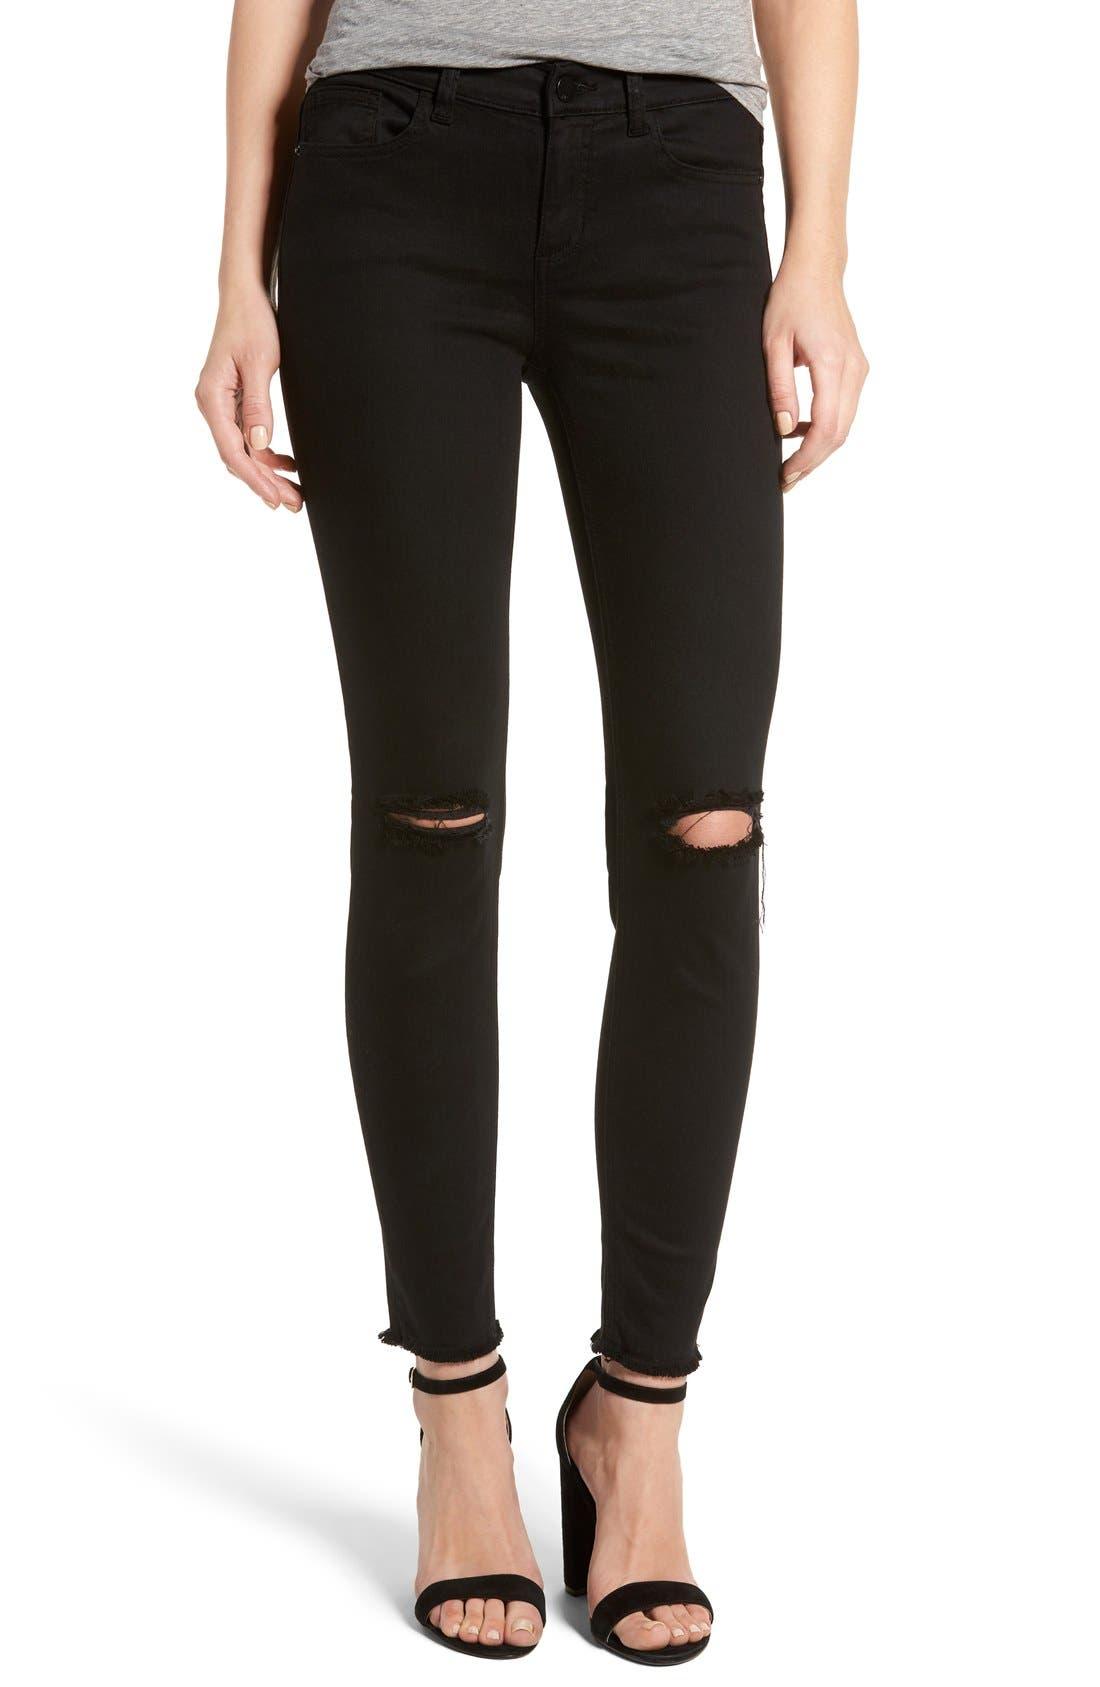 Alternate Image 1 Selected - SP Black Slit Knee Skinny Jeans